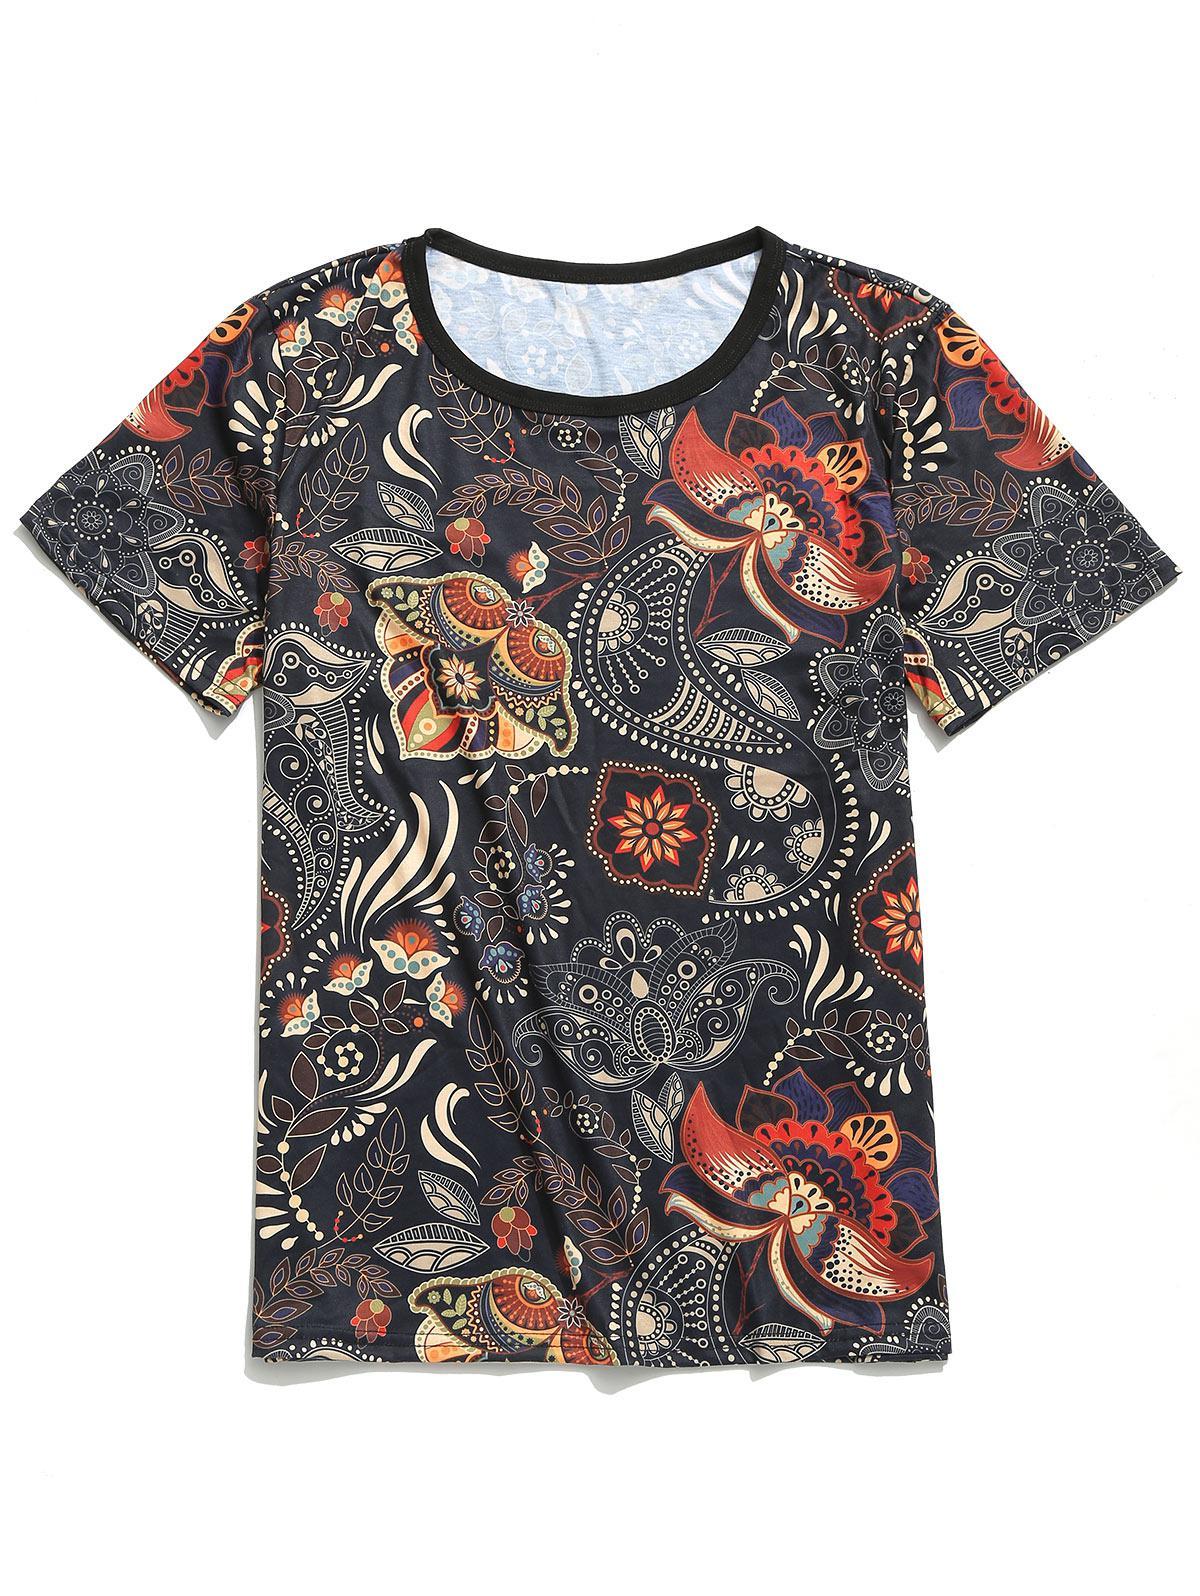 Maniche corte Tribale Paisley Stampa floreale T-shirt